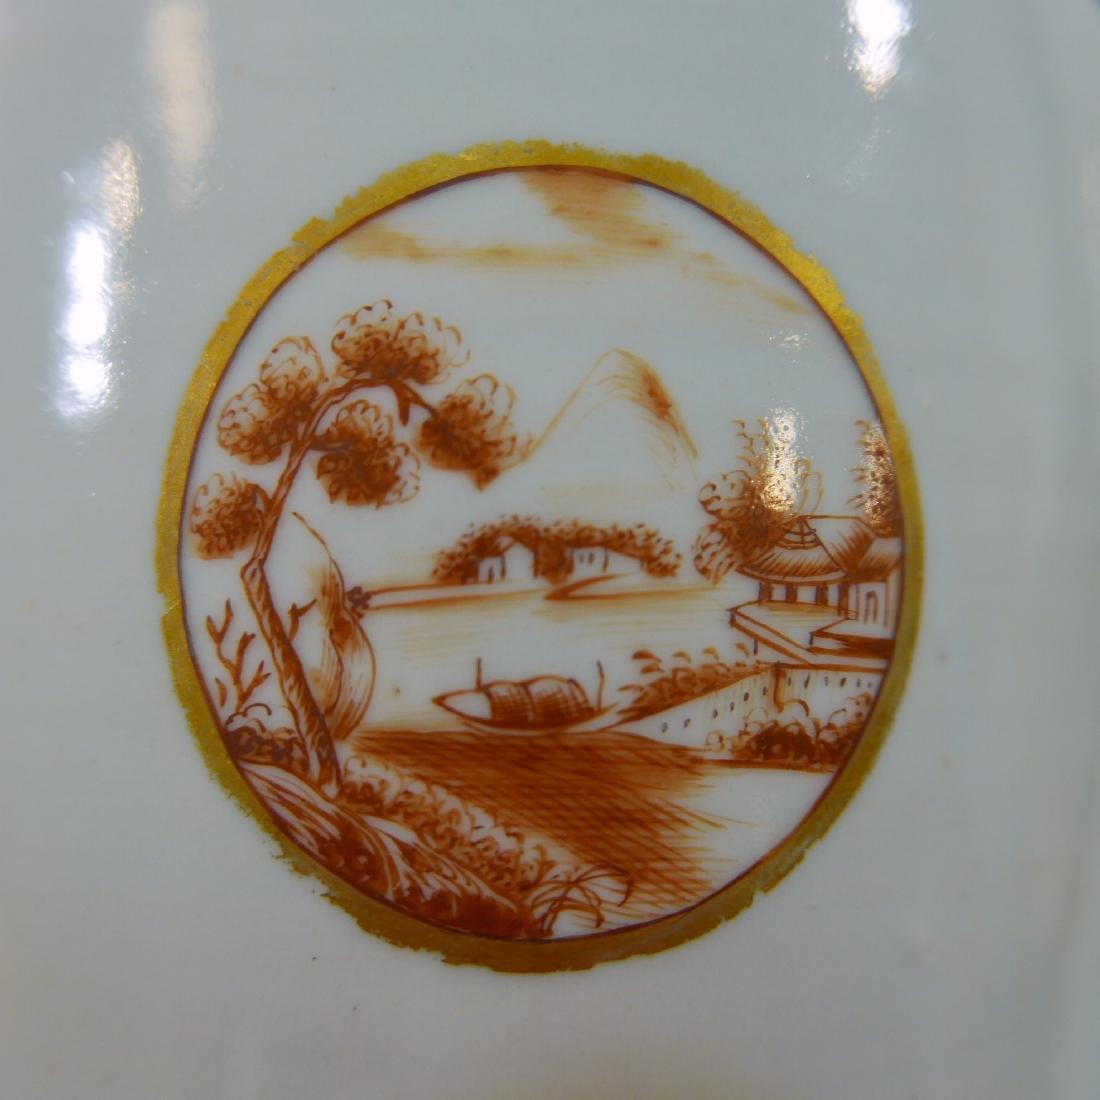 RARE ANTIQUE CHINESE PORCELAIN TEAPOT - 18TH CENTURY - 6